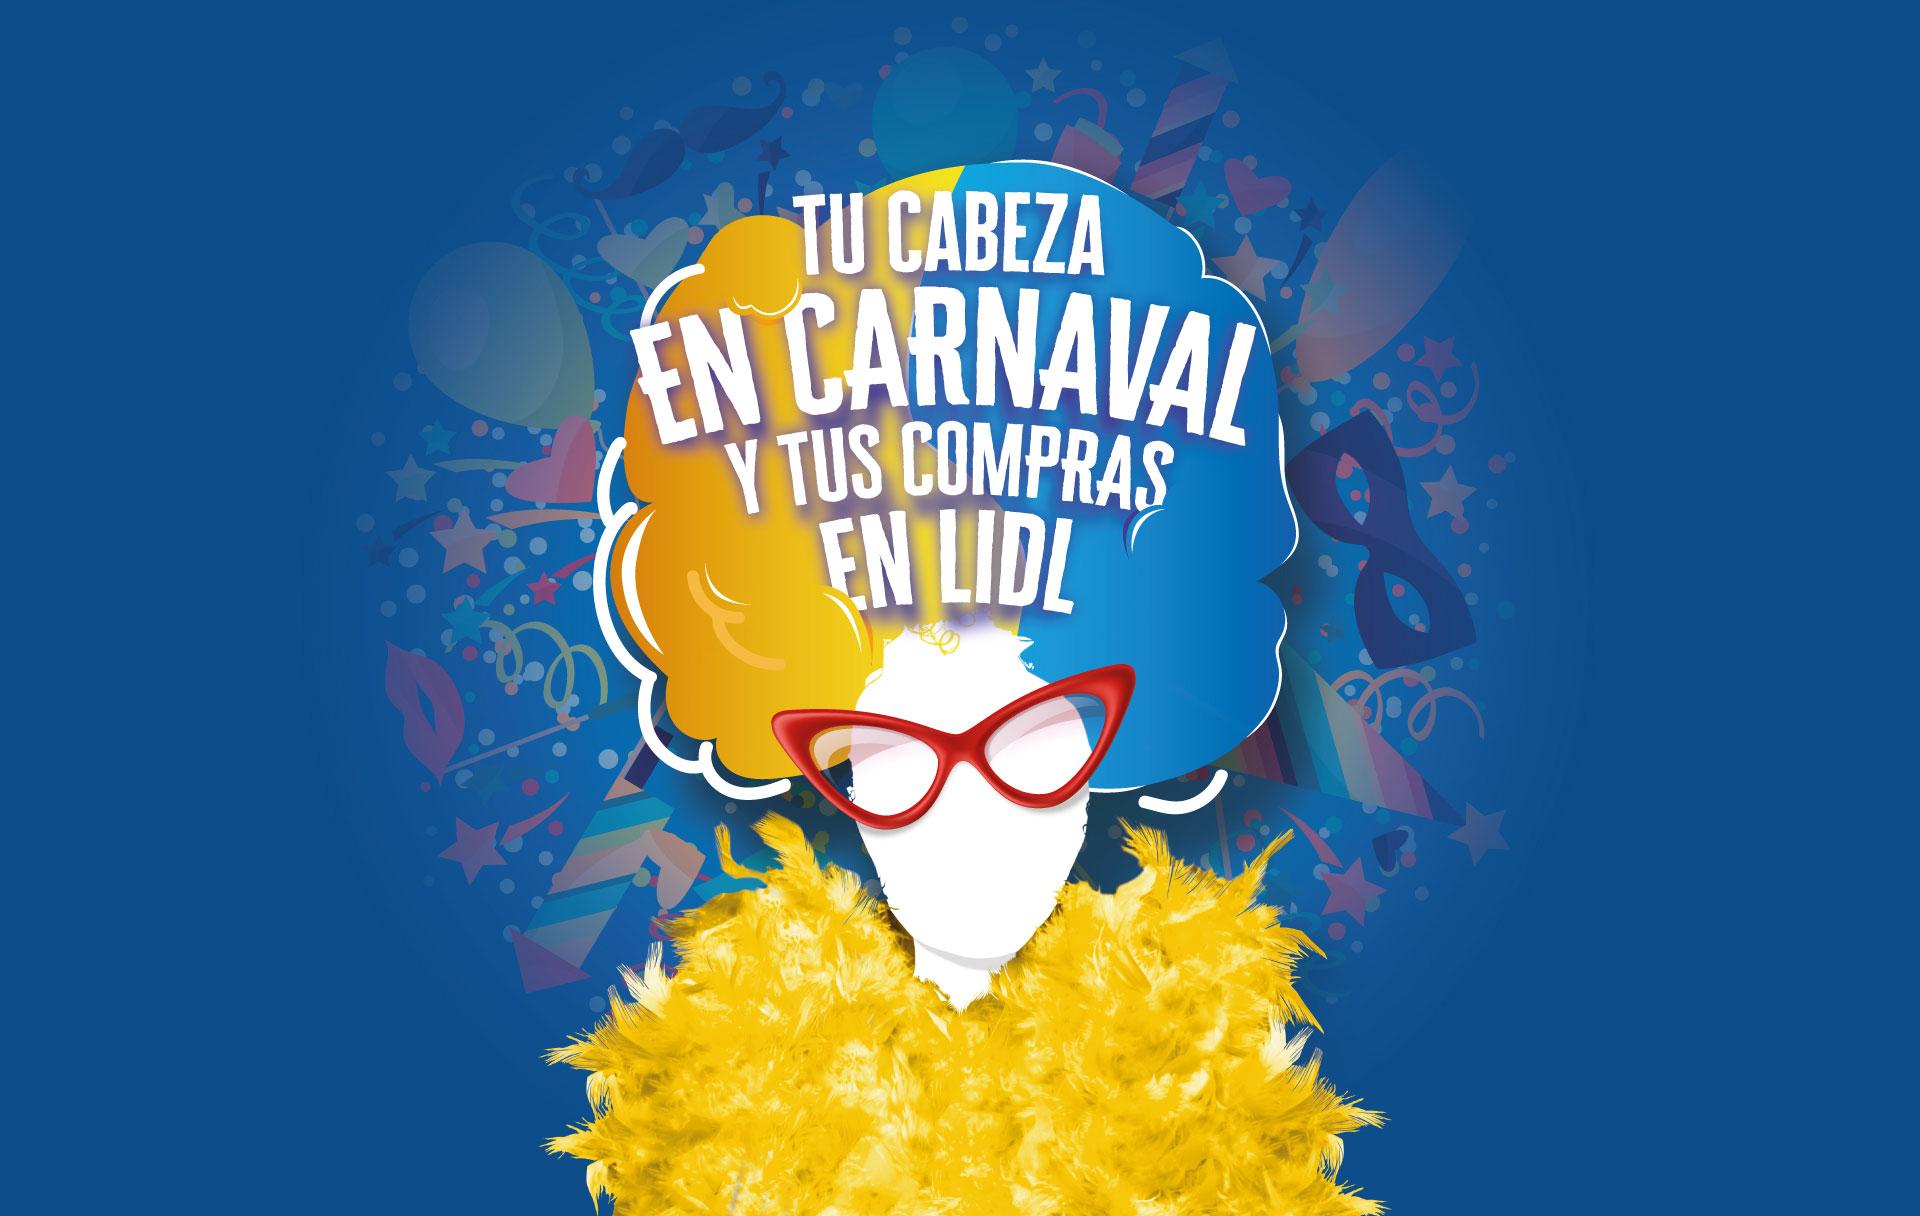 imagen-carnaval-lidl-canarias-2020